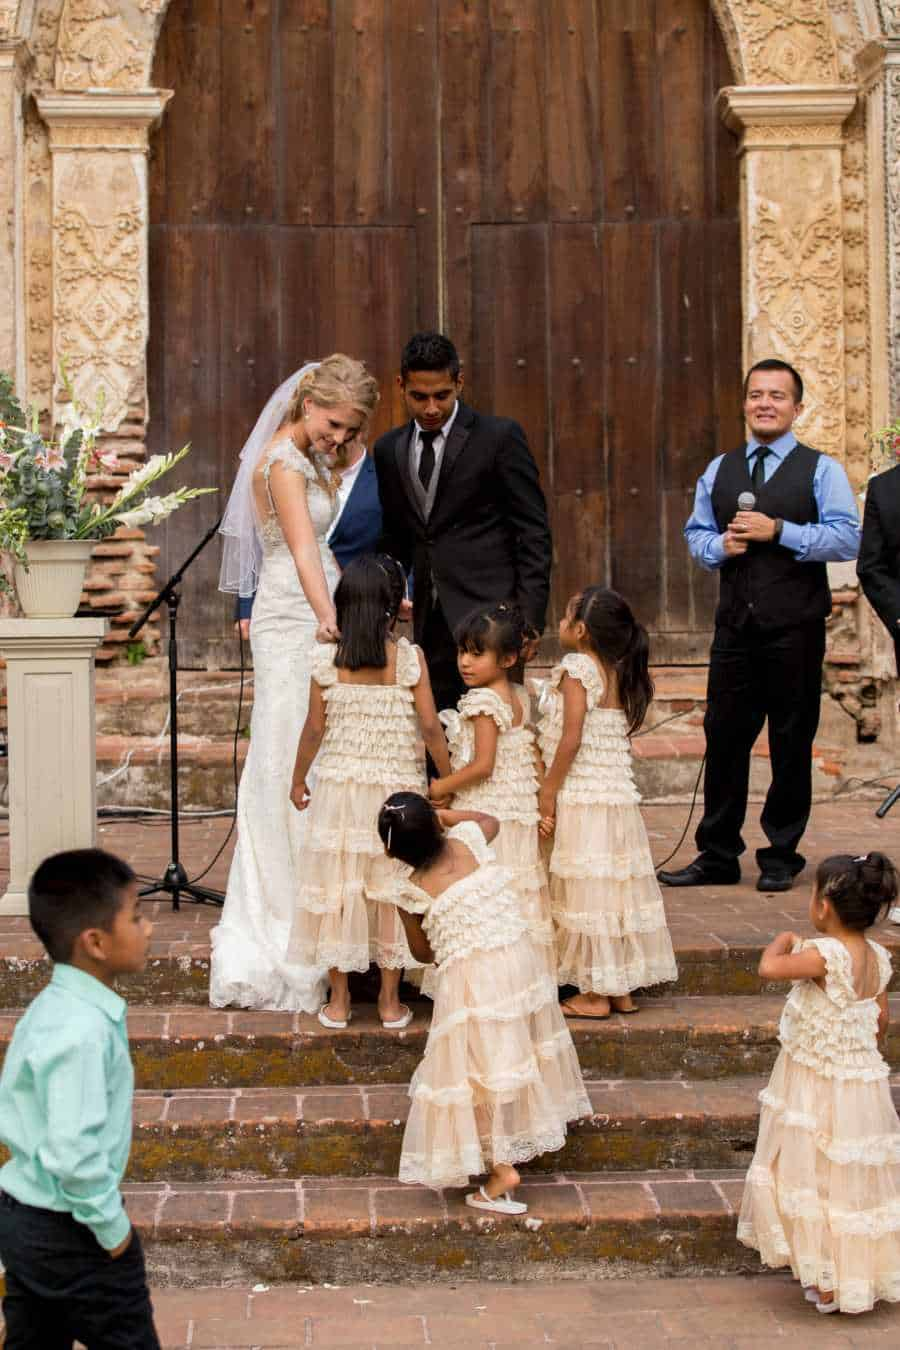 Addisy getting married to Ronald, wedding photo.